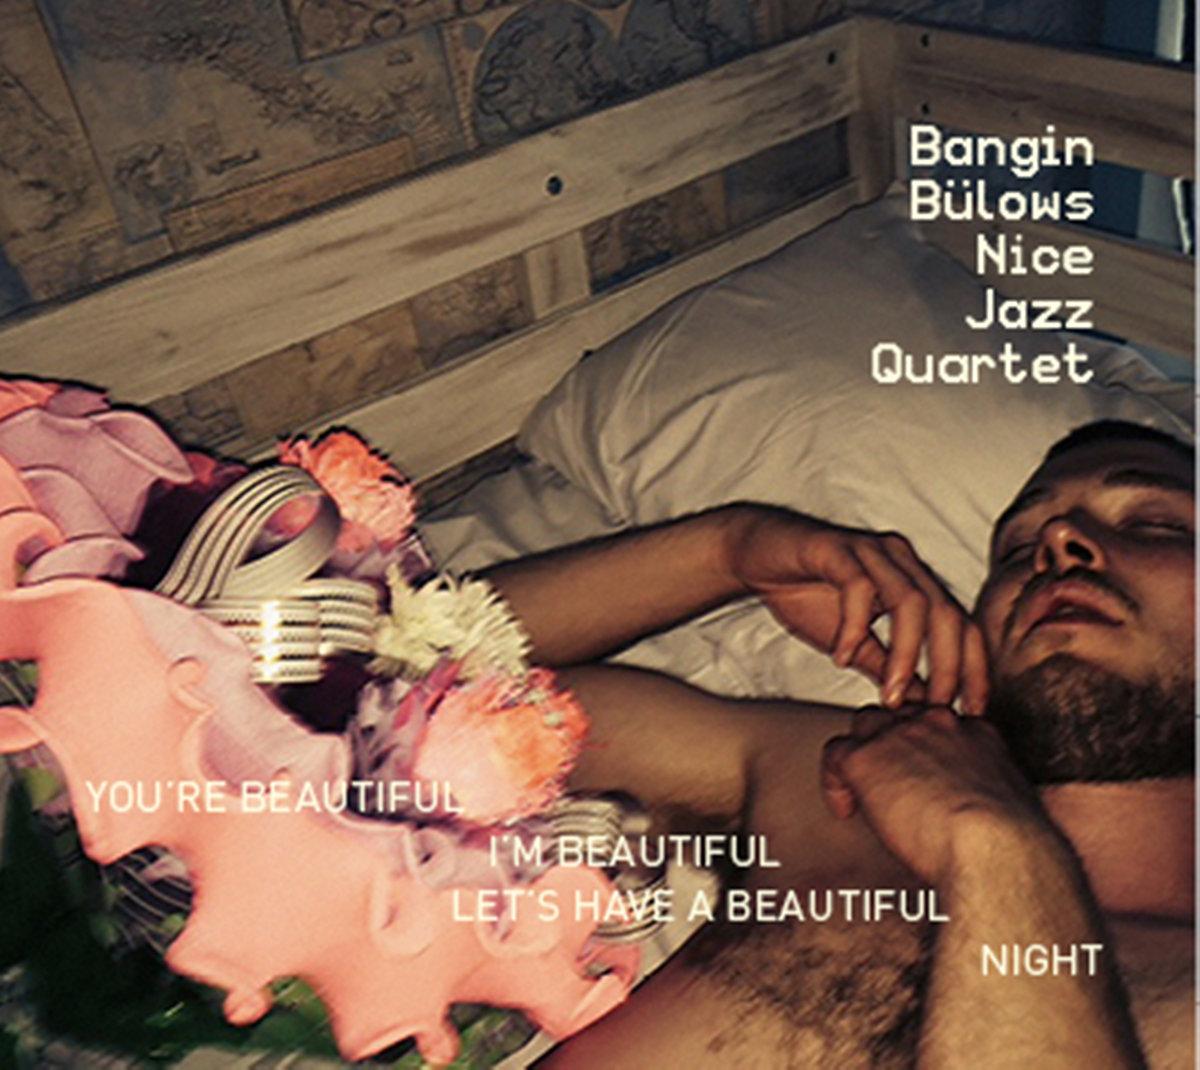 Bangin' Bülows Nice Jazz Quartet